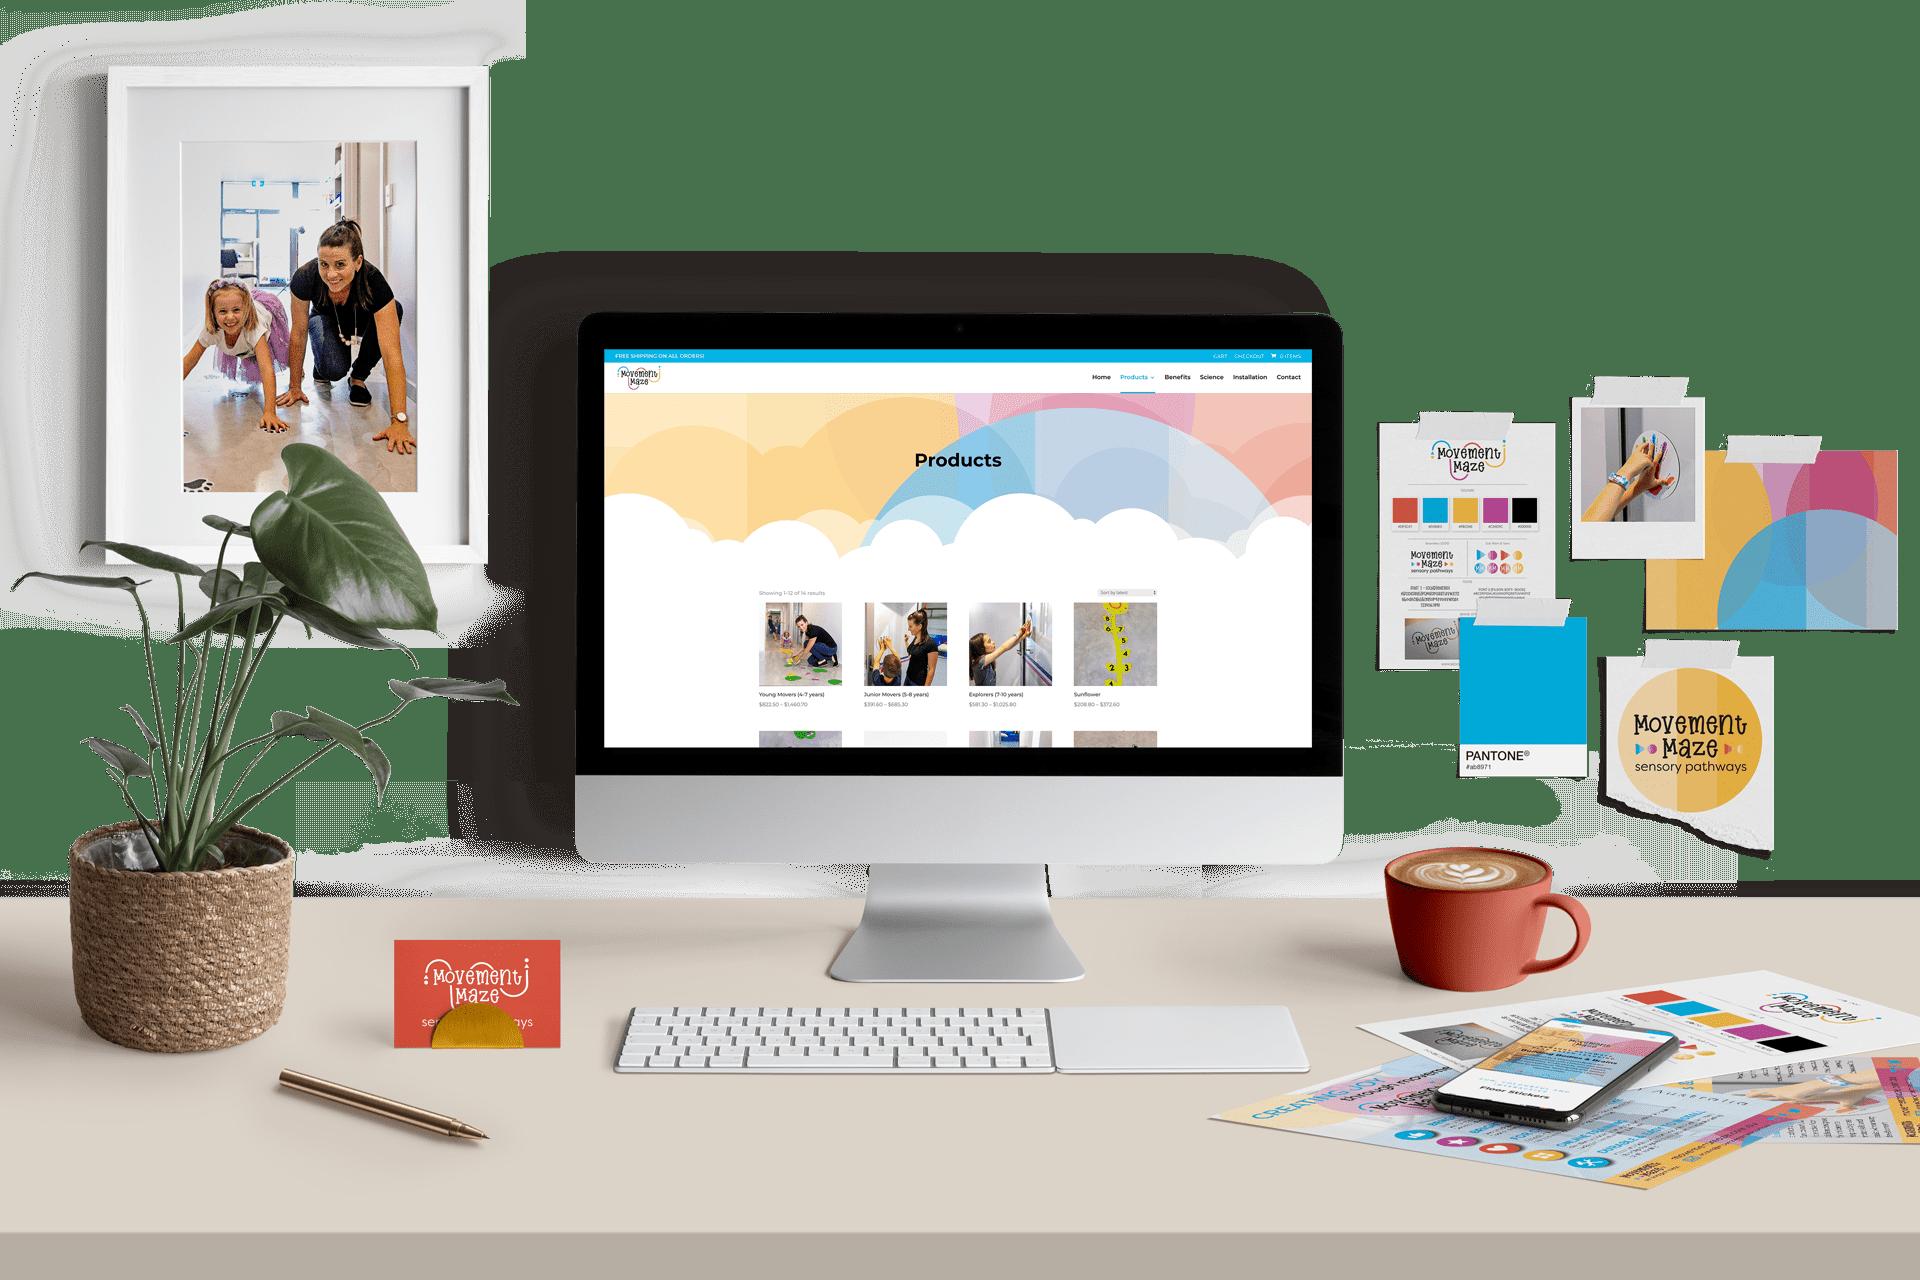 Project_Movement-Maze_Website-Design